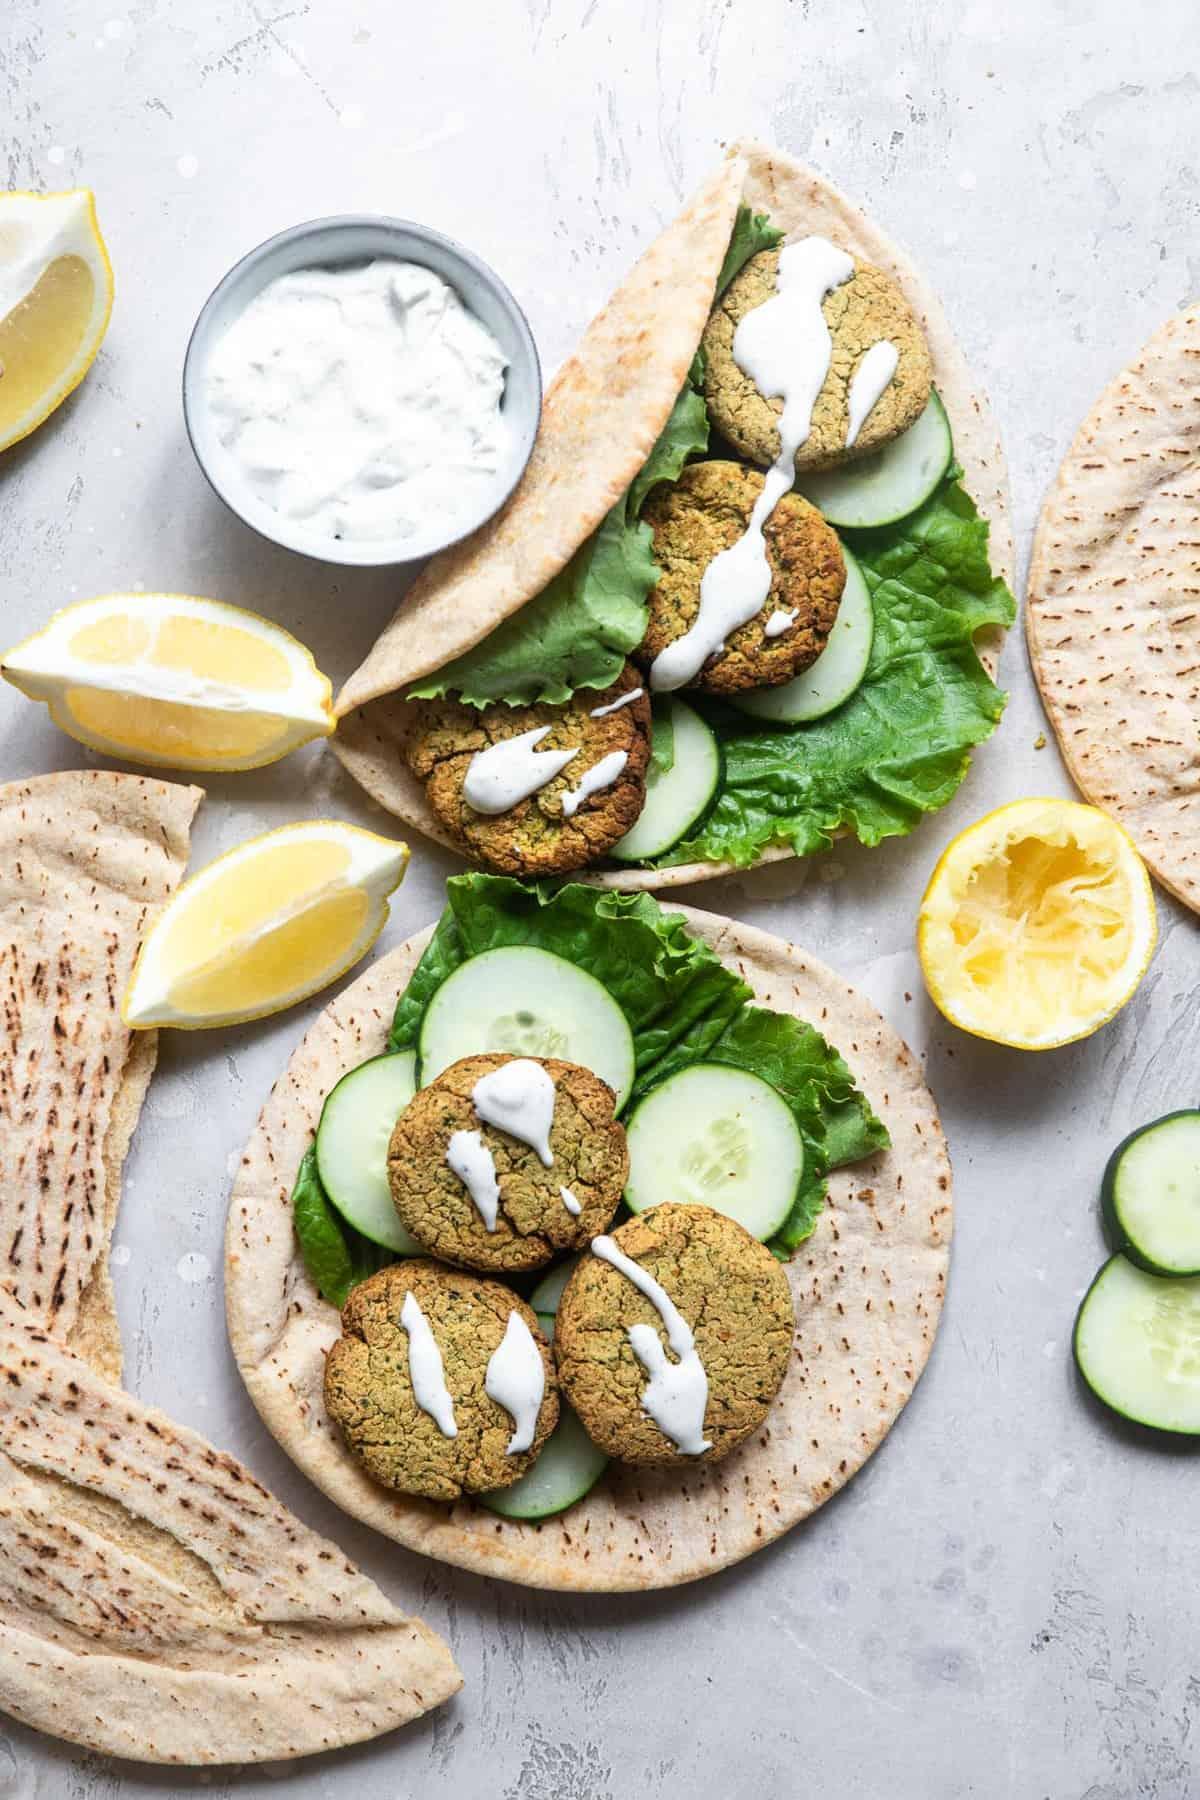 Air fryer falafel on pita bread on a table